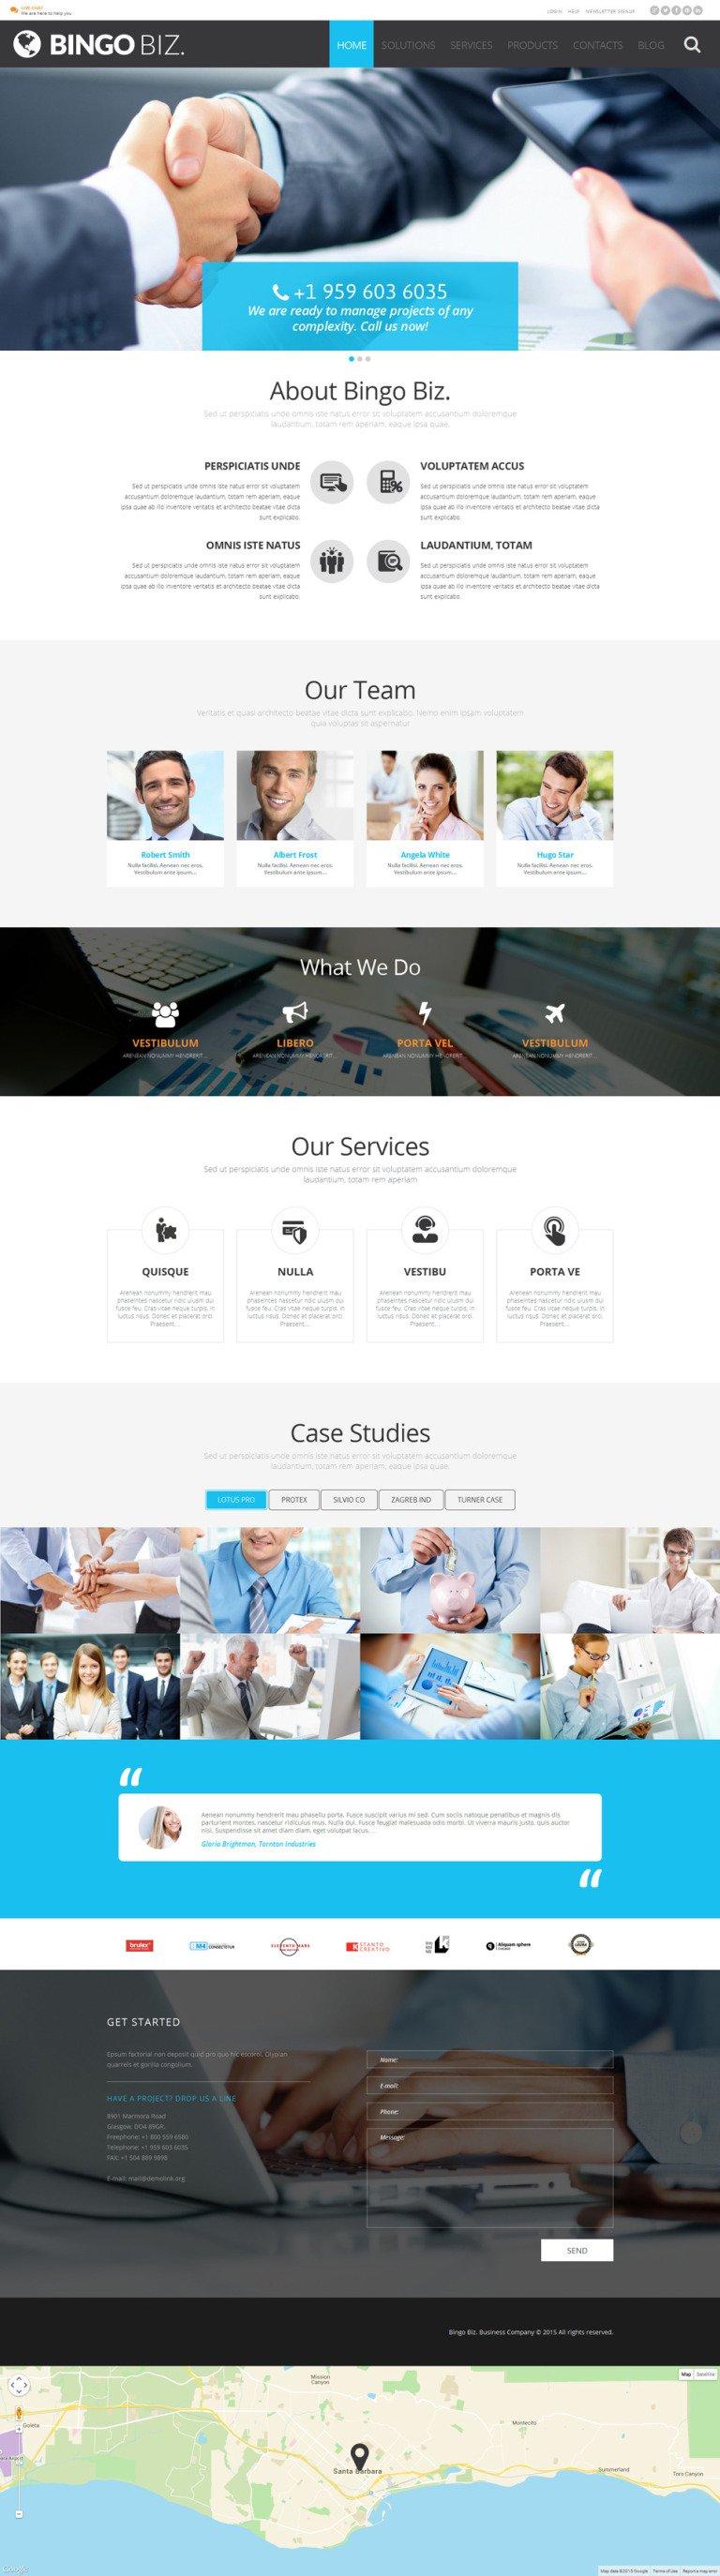 Corporate Identity WordPress Theme New Screenshots BIG